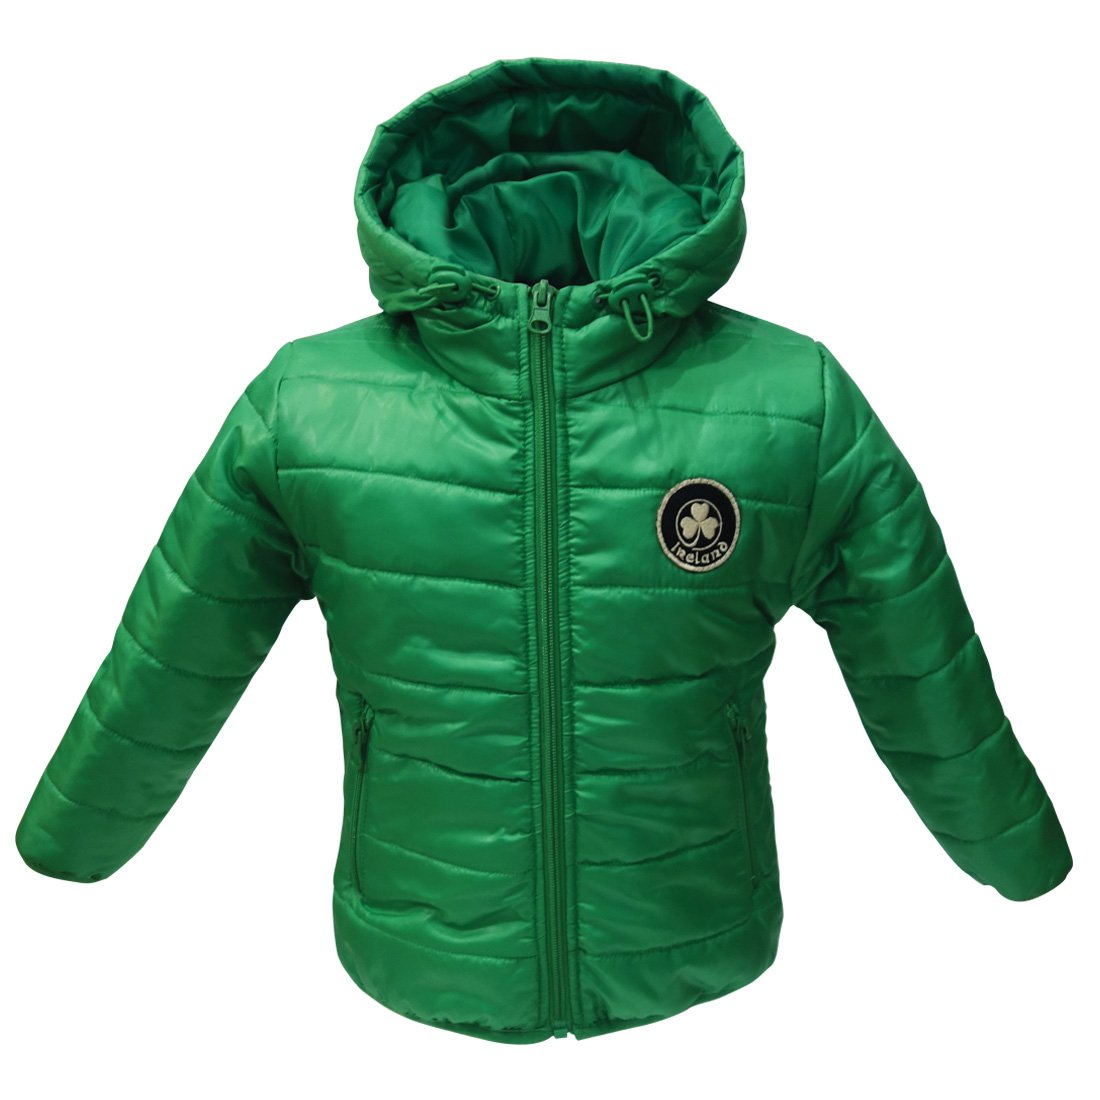 Carrolls Irish Gifts Green Ireland Shamrock Puff Kids Jacket